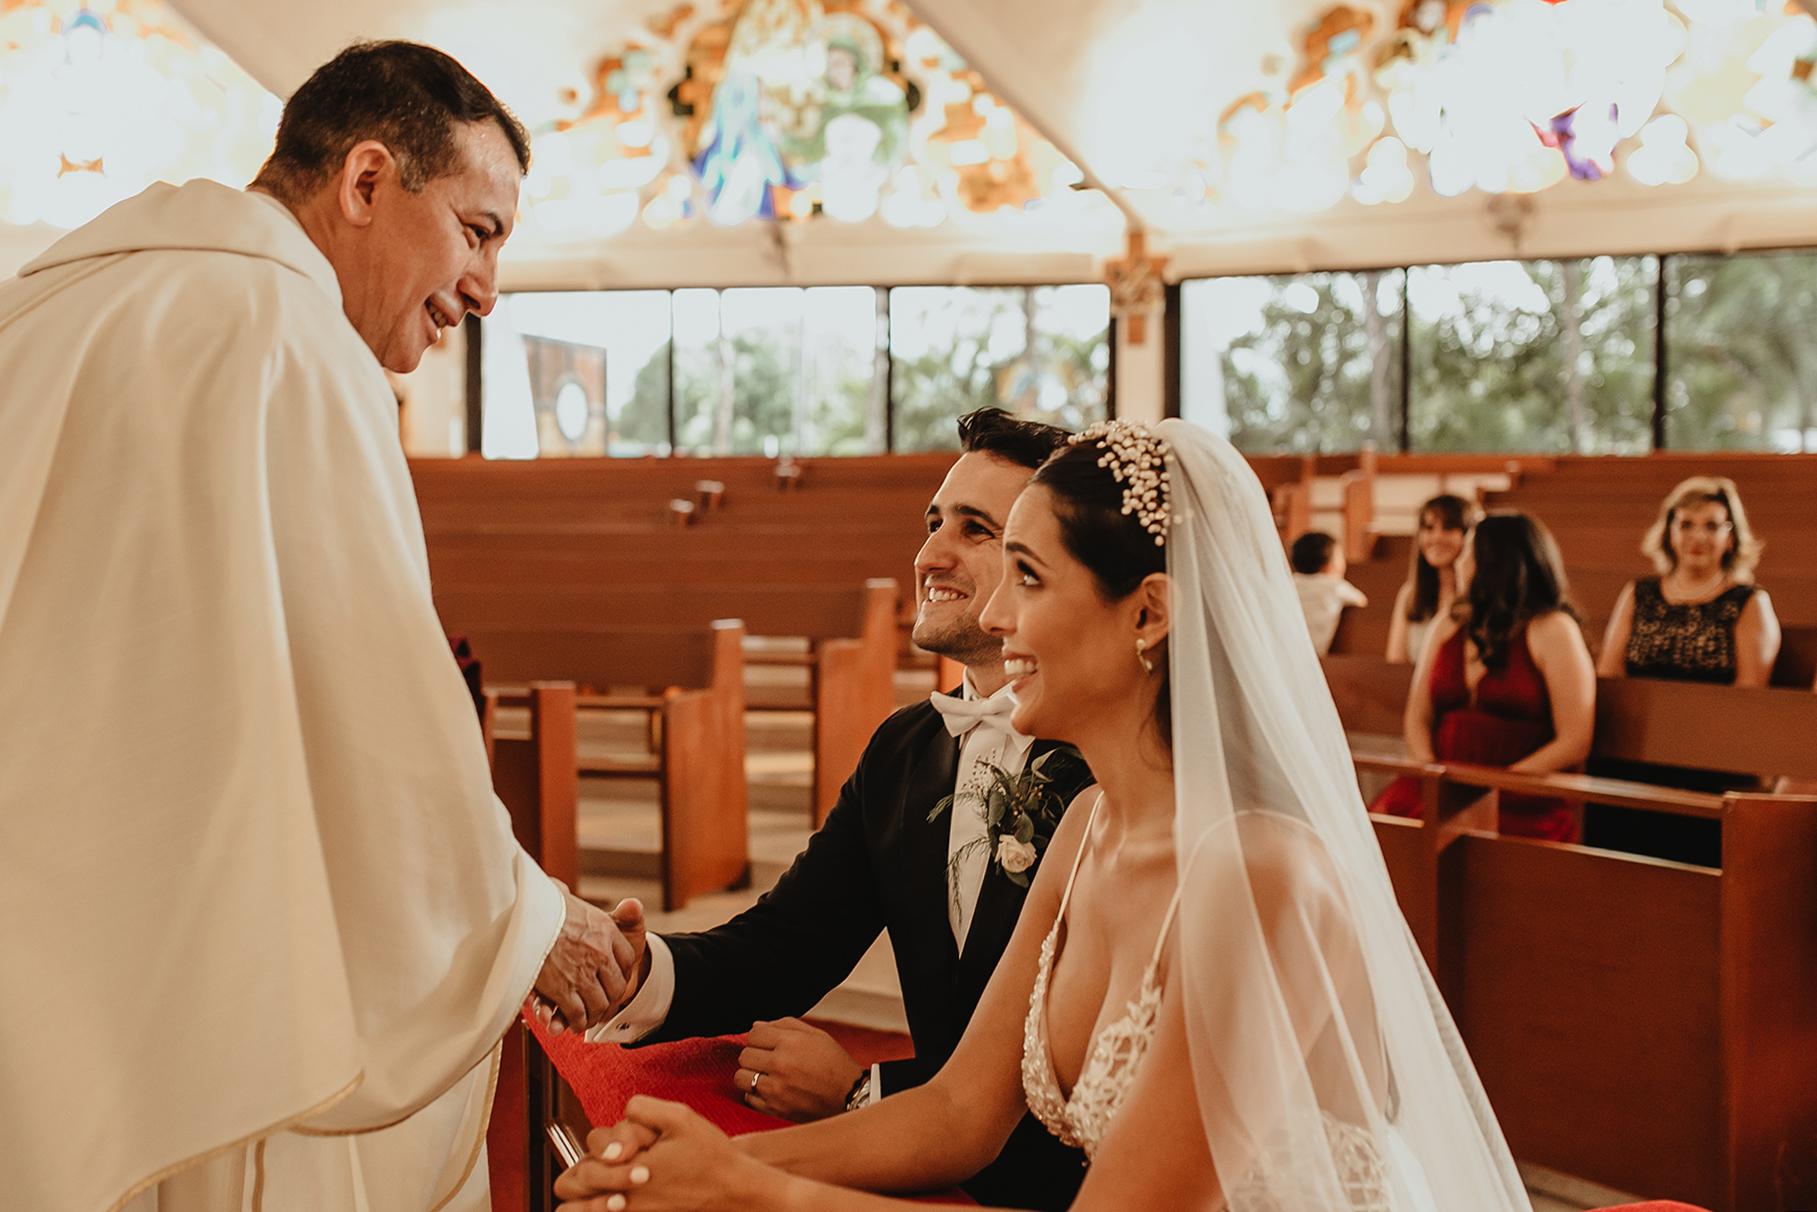 0677R&F__WeddingDestination_Weddingmerida_BodaMexico_FotografoDeBodas_FabrizioSimoneenFotografo.jpg